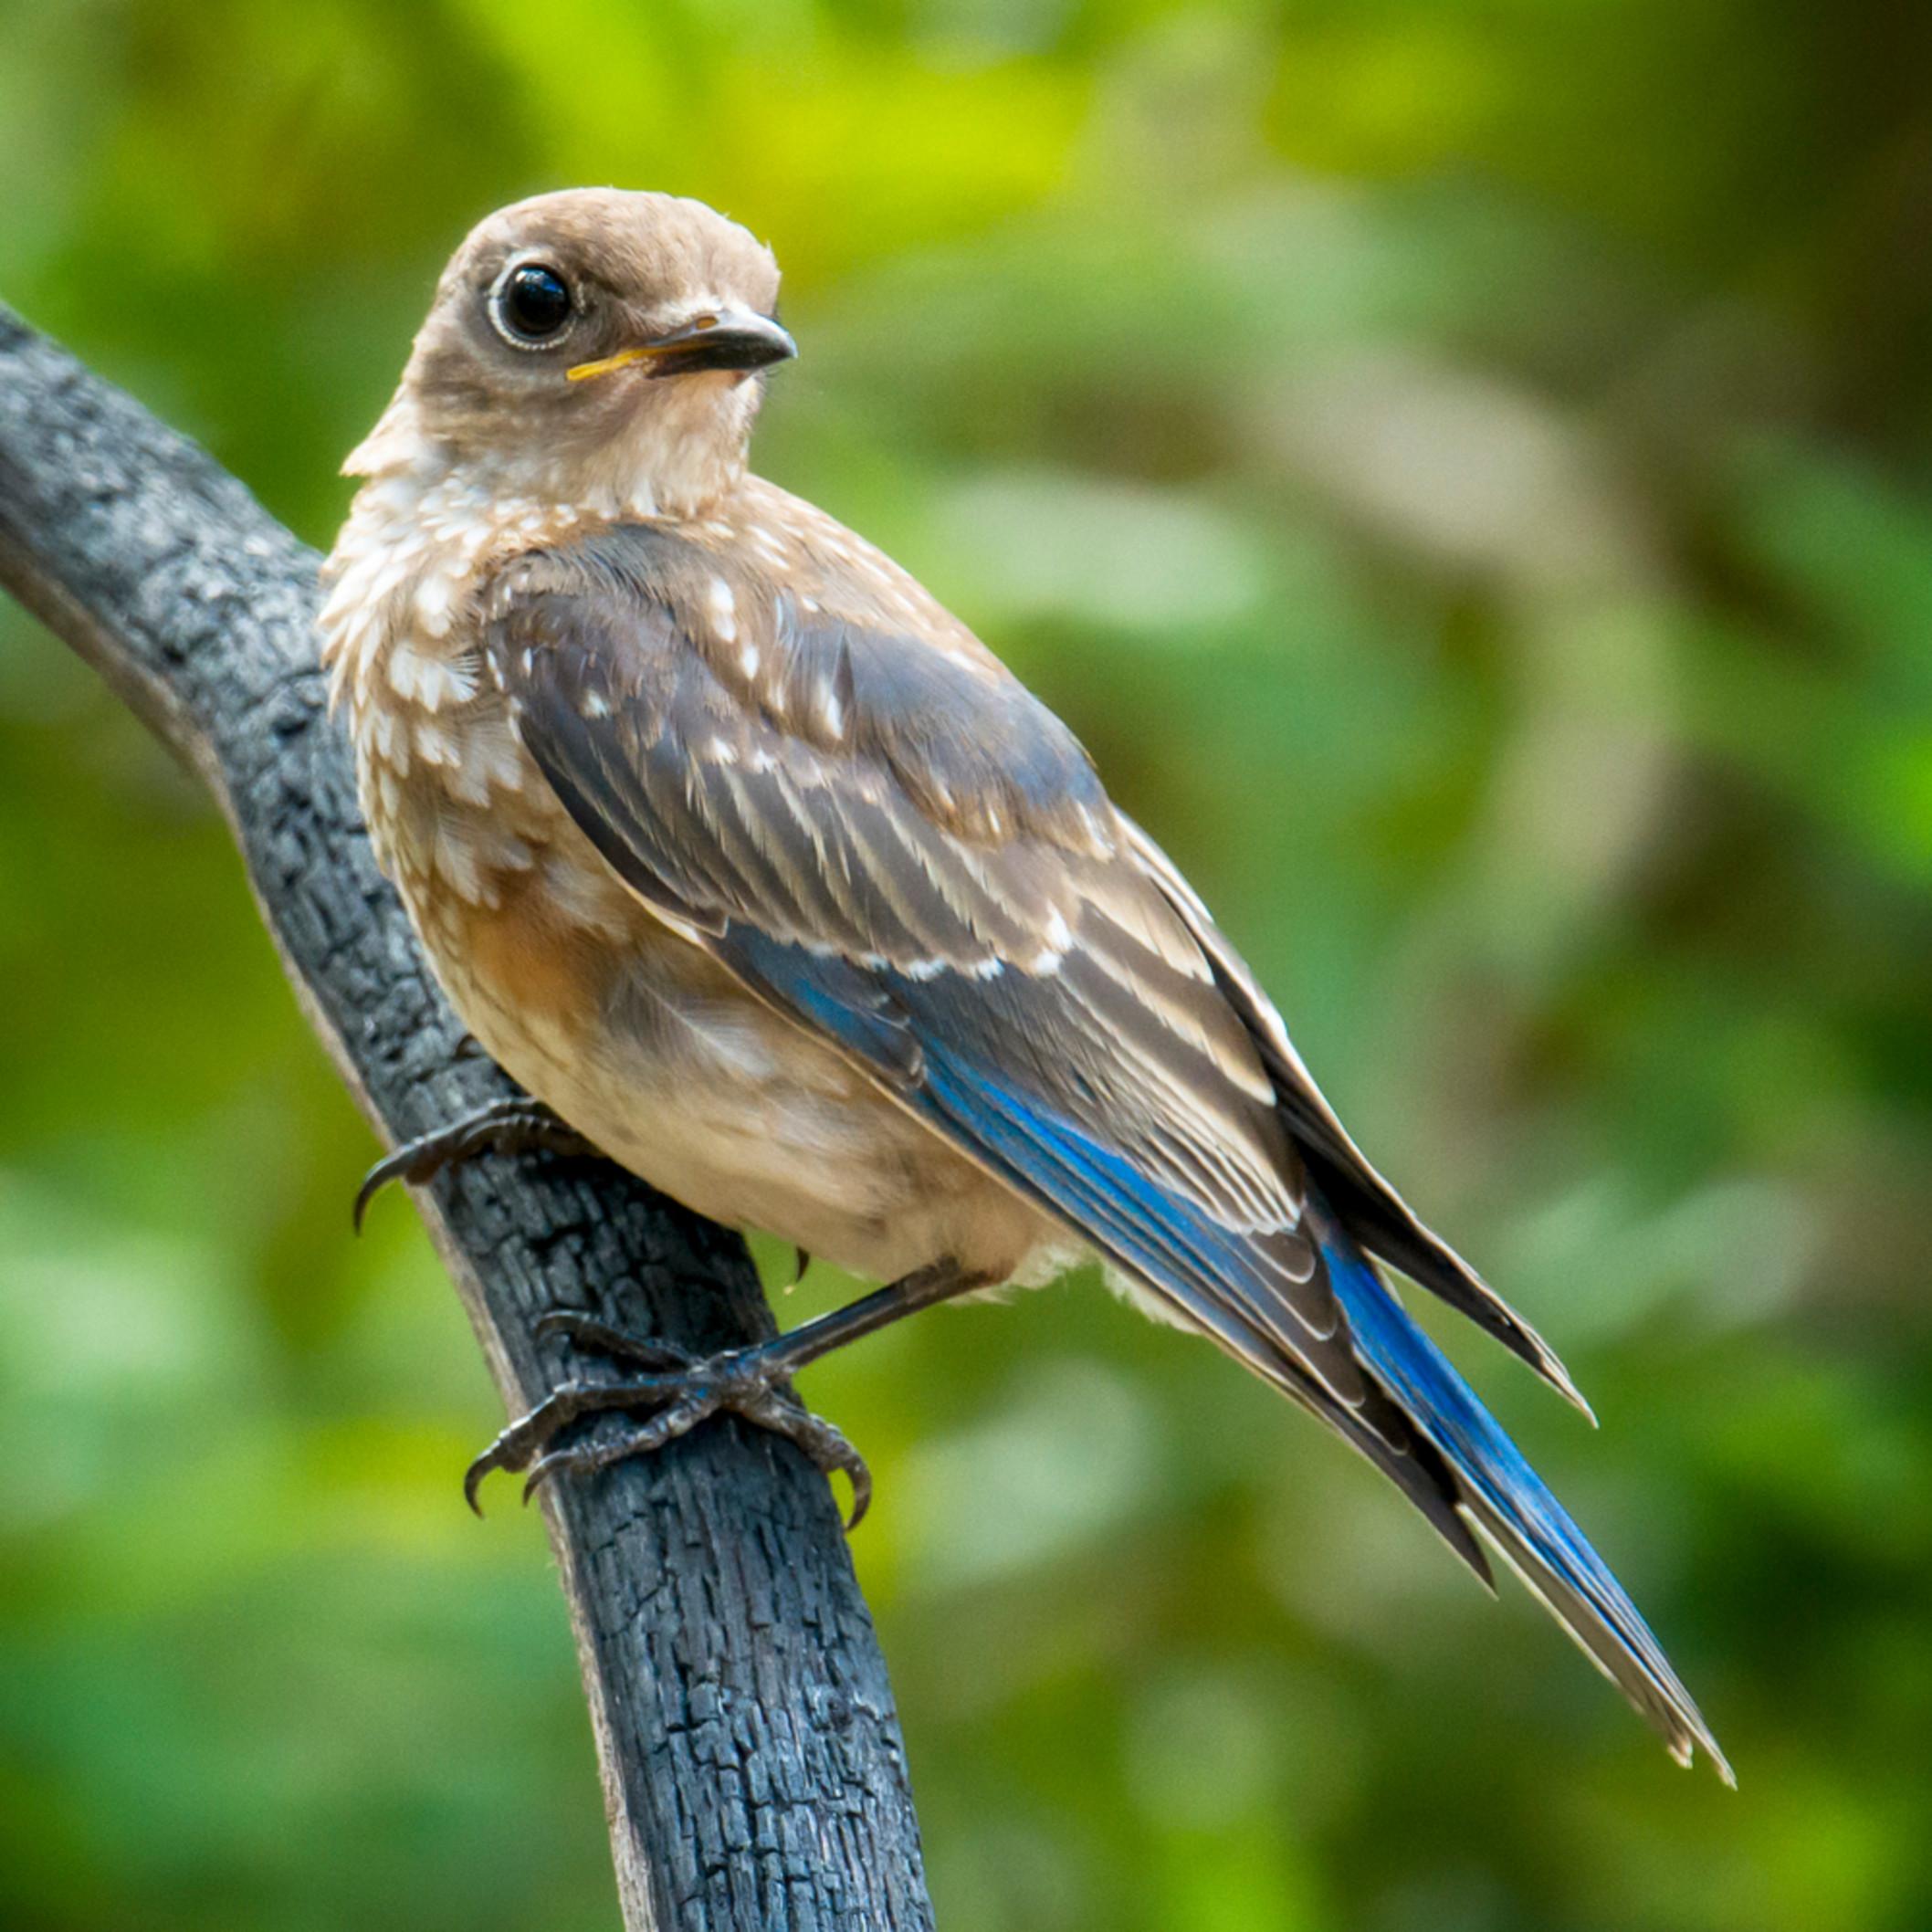 By birds 20200711 1324 cwvjir